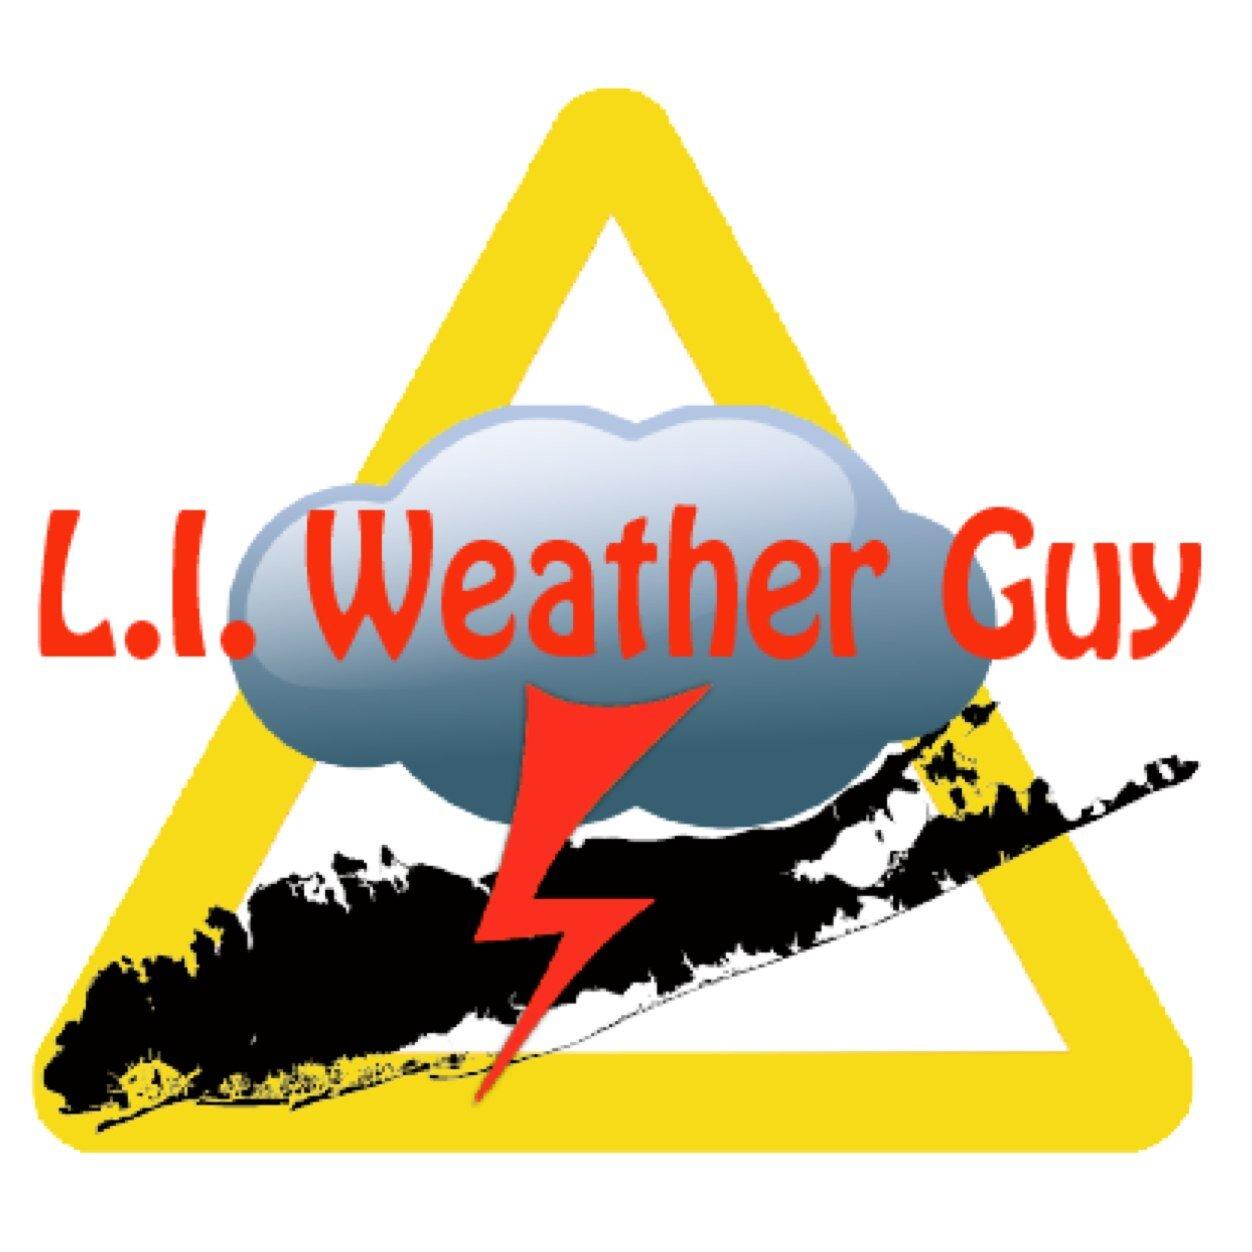 L.I. Weather Guy